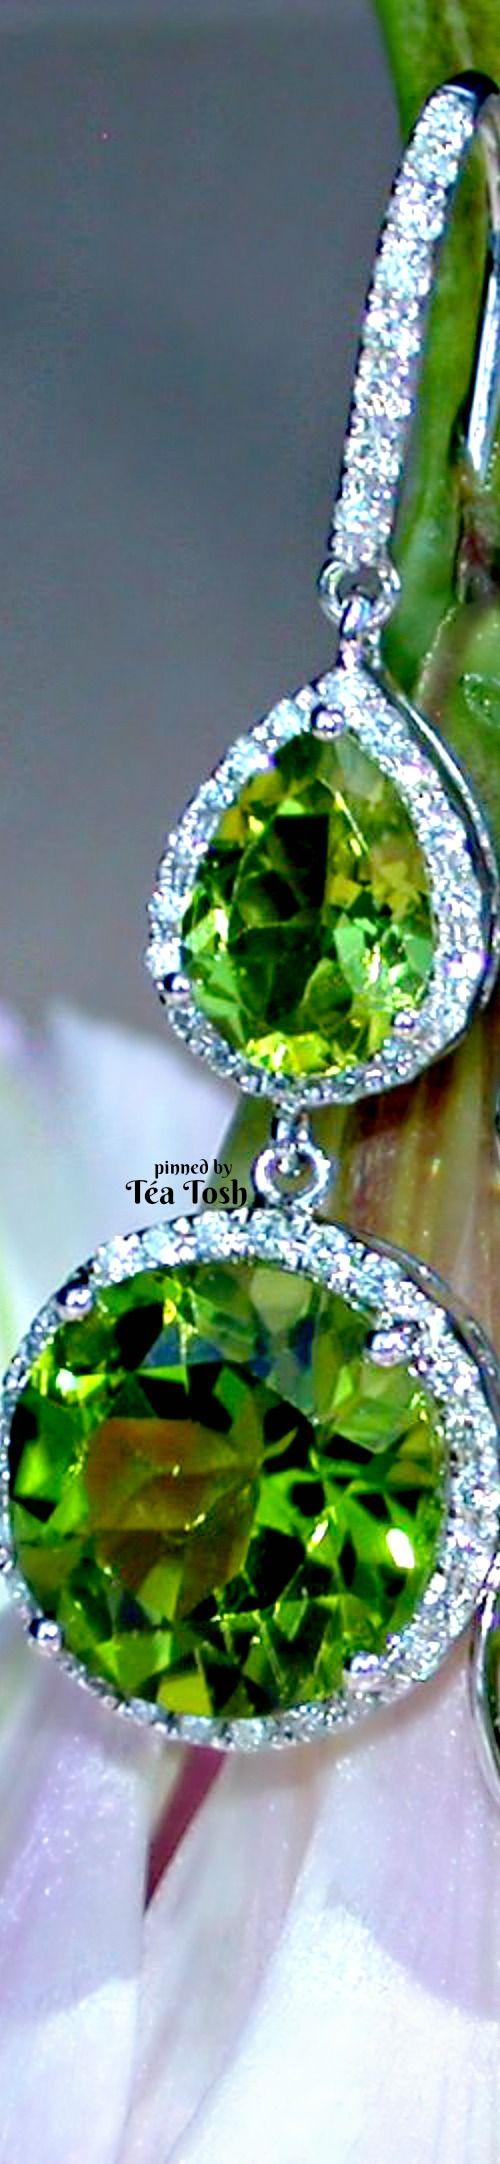 ❇Téa Tosh❇  Peridot and diamond earrings